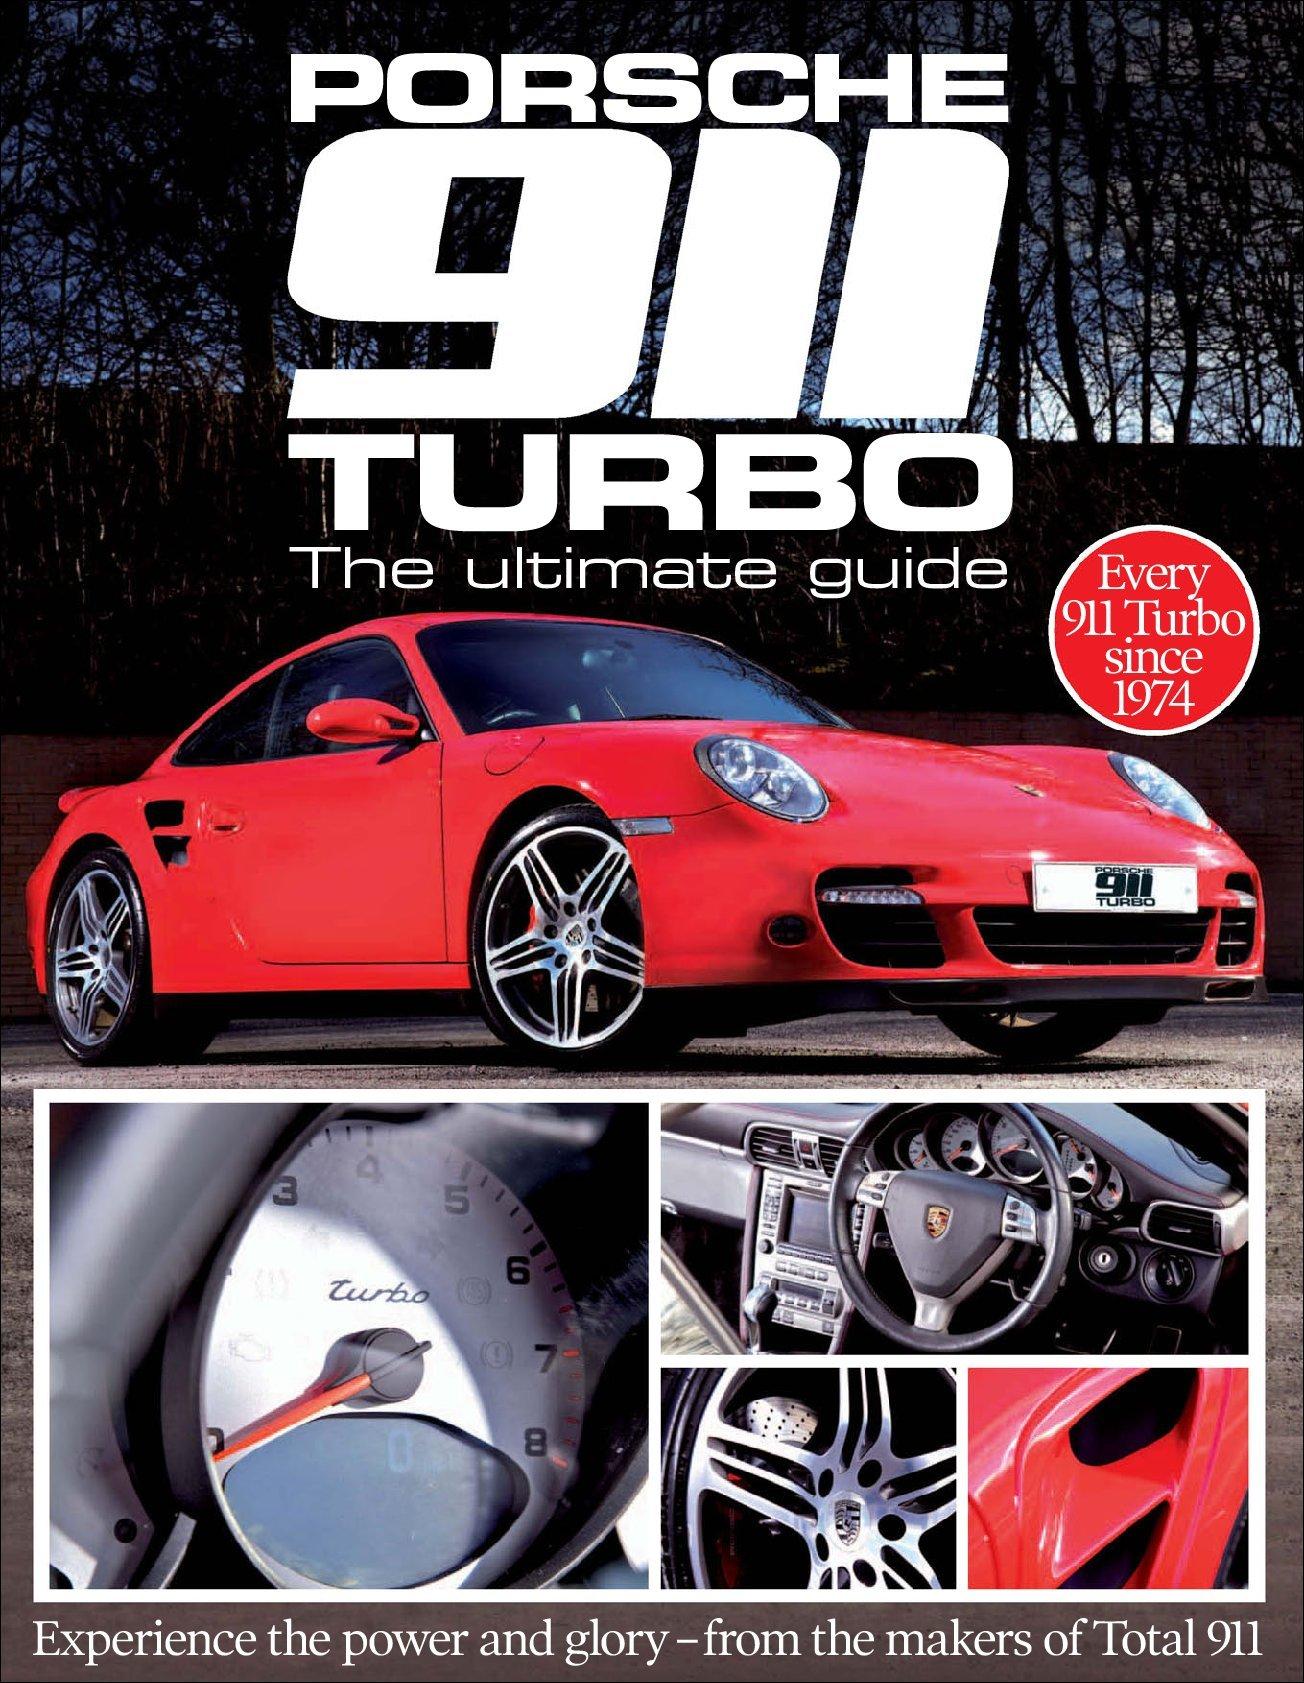 8d430129071 Porsche 911 Turbo: The Ultimate Guide Magazine Subscription (Digital)